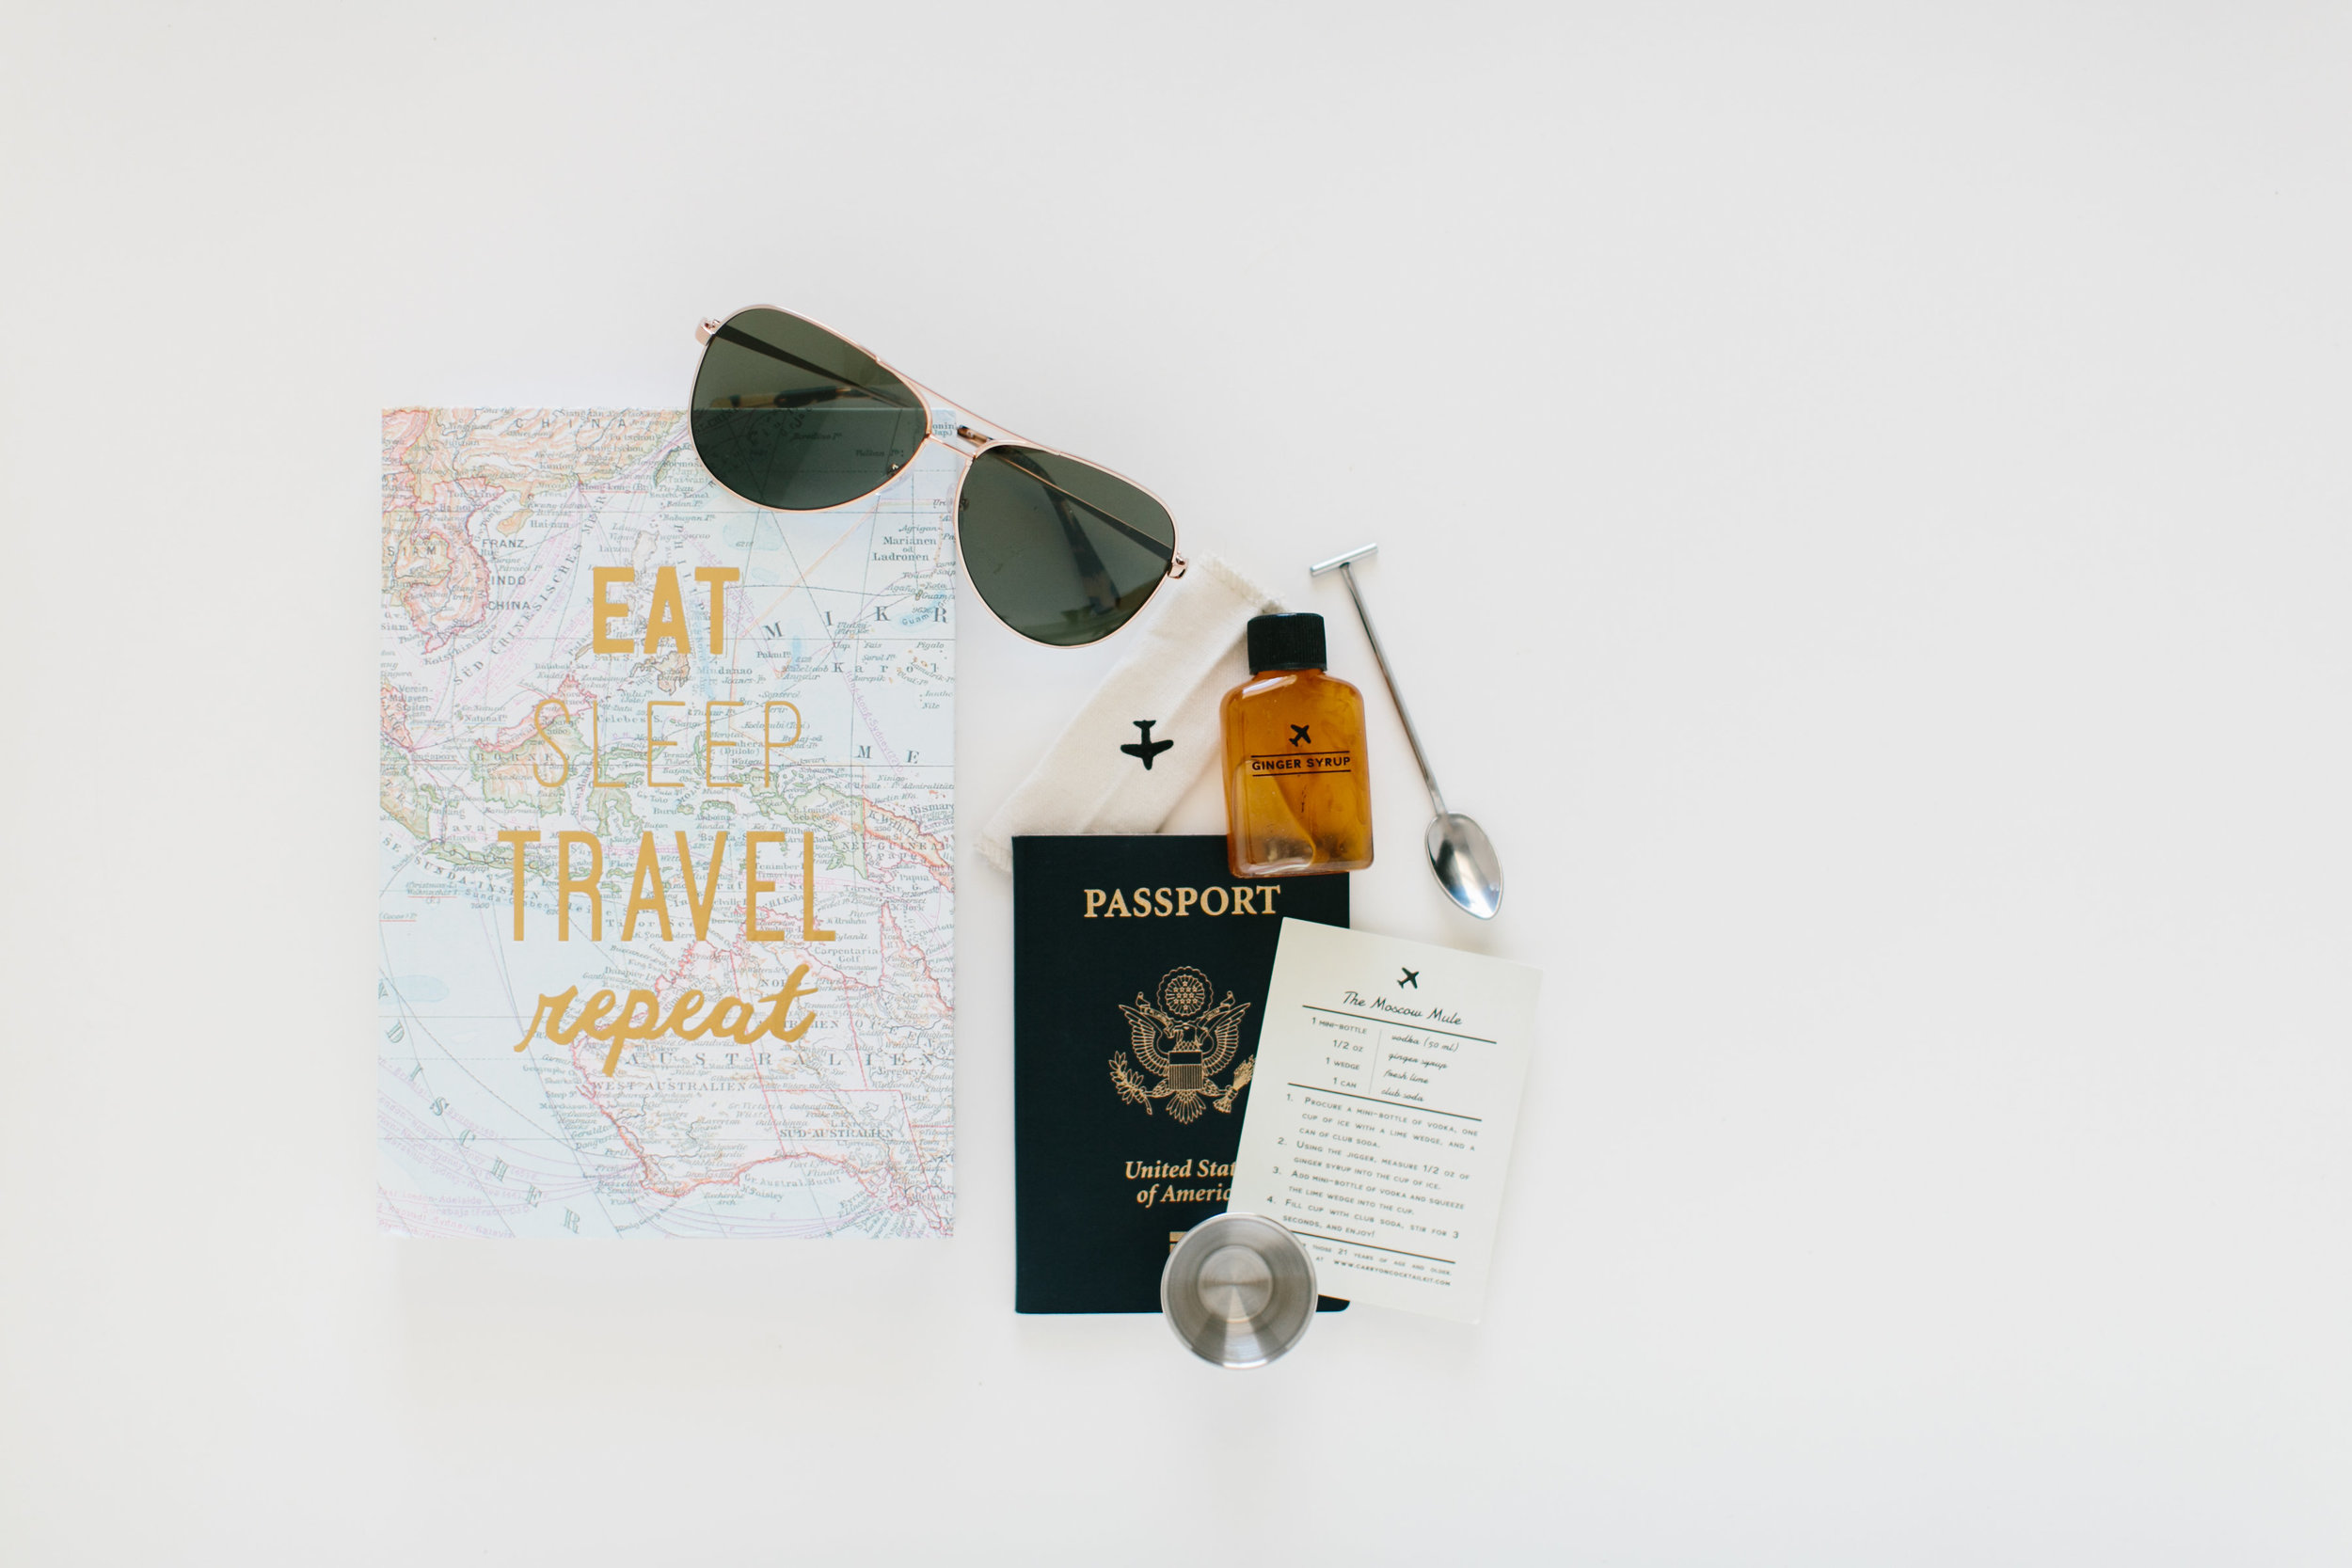 Eat Sleep Travel Repeat